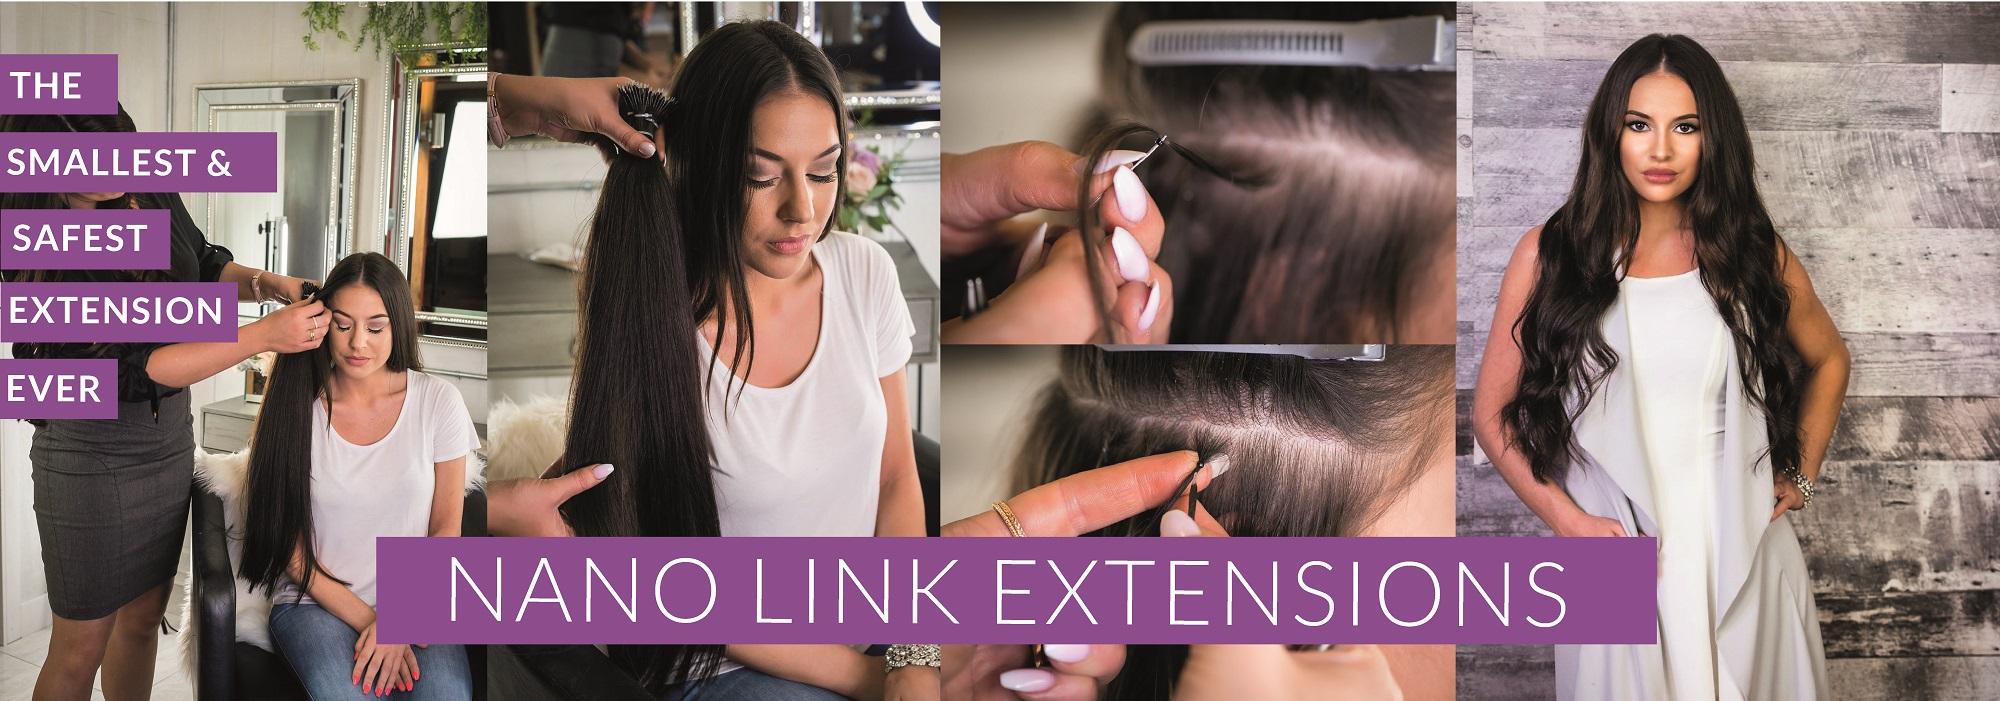 nano-link-hair-extensions-banner-2018.jpg